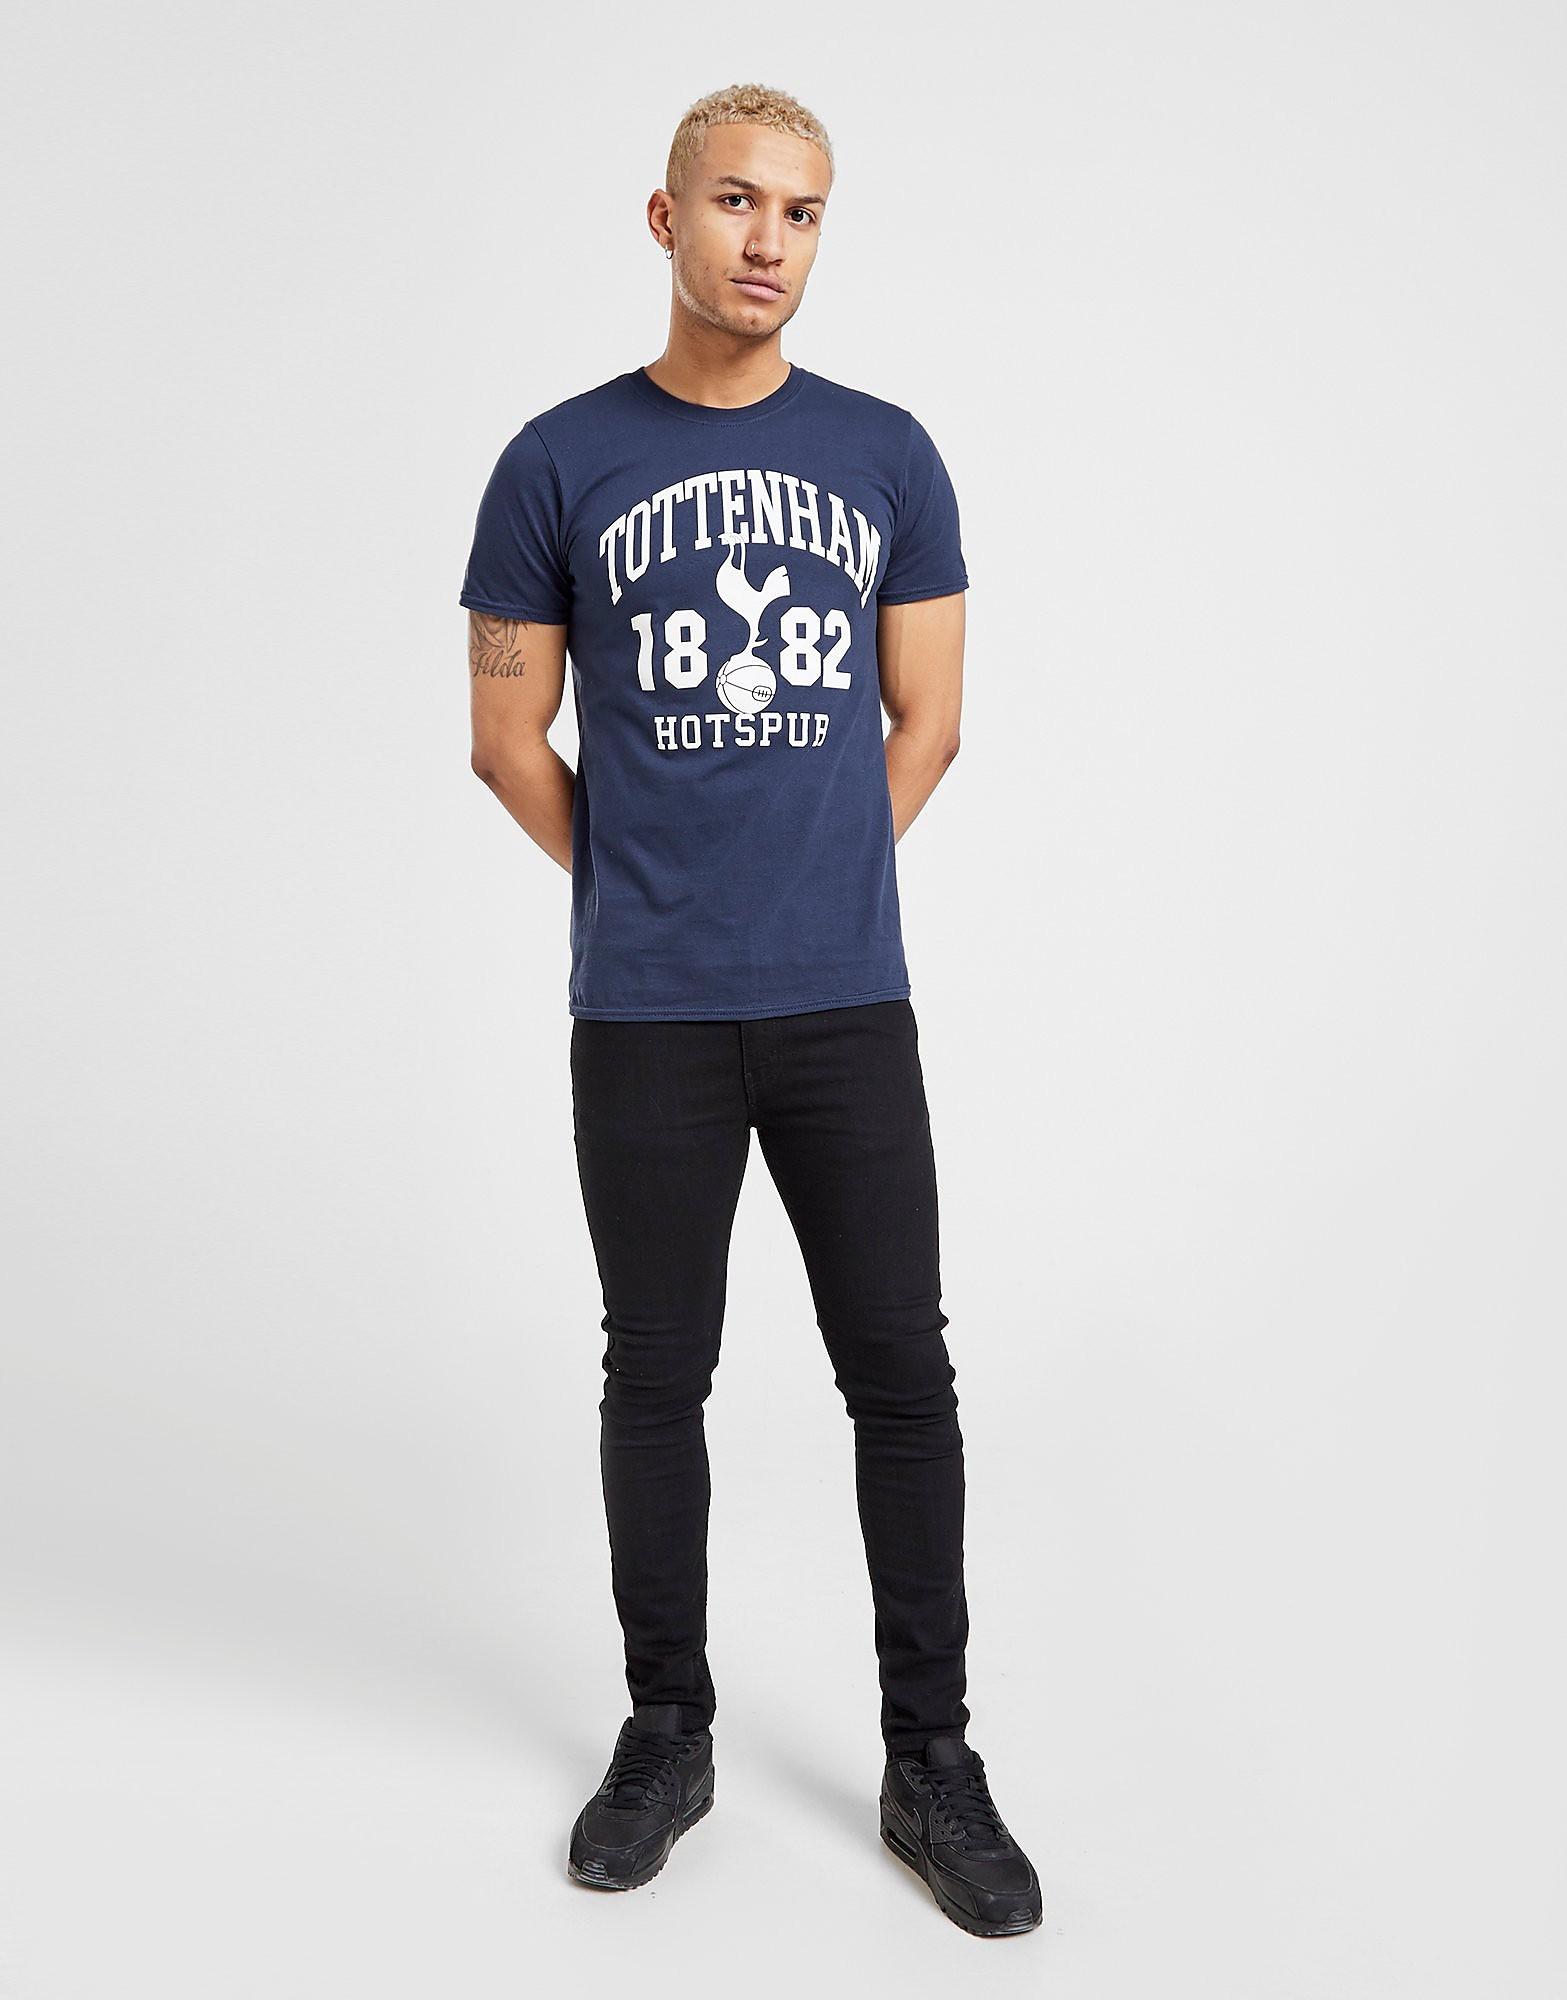 SOURCE LAB LTD Tottenham Hotspur FC 1882 T-Shirt